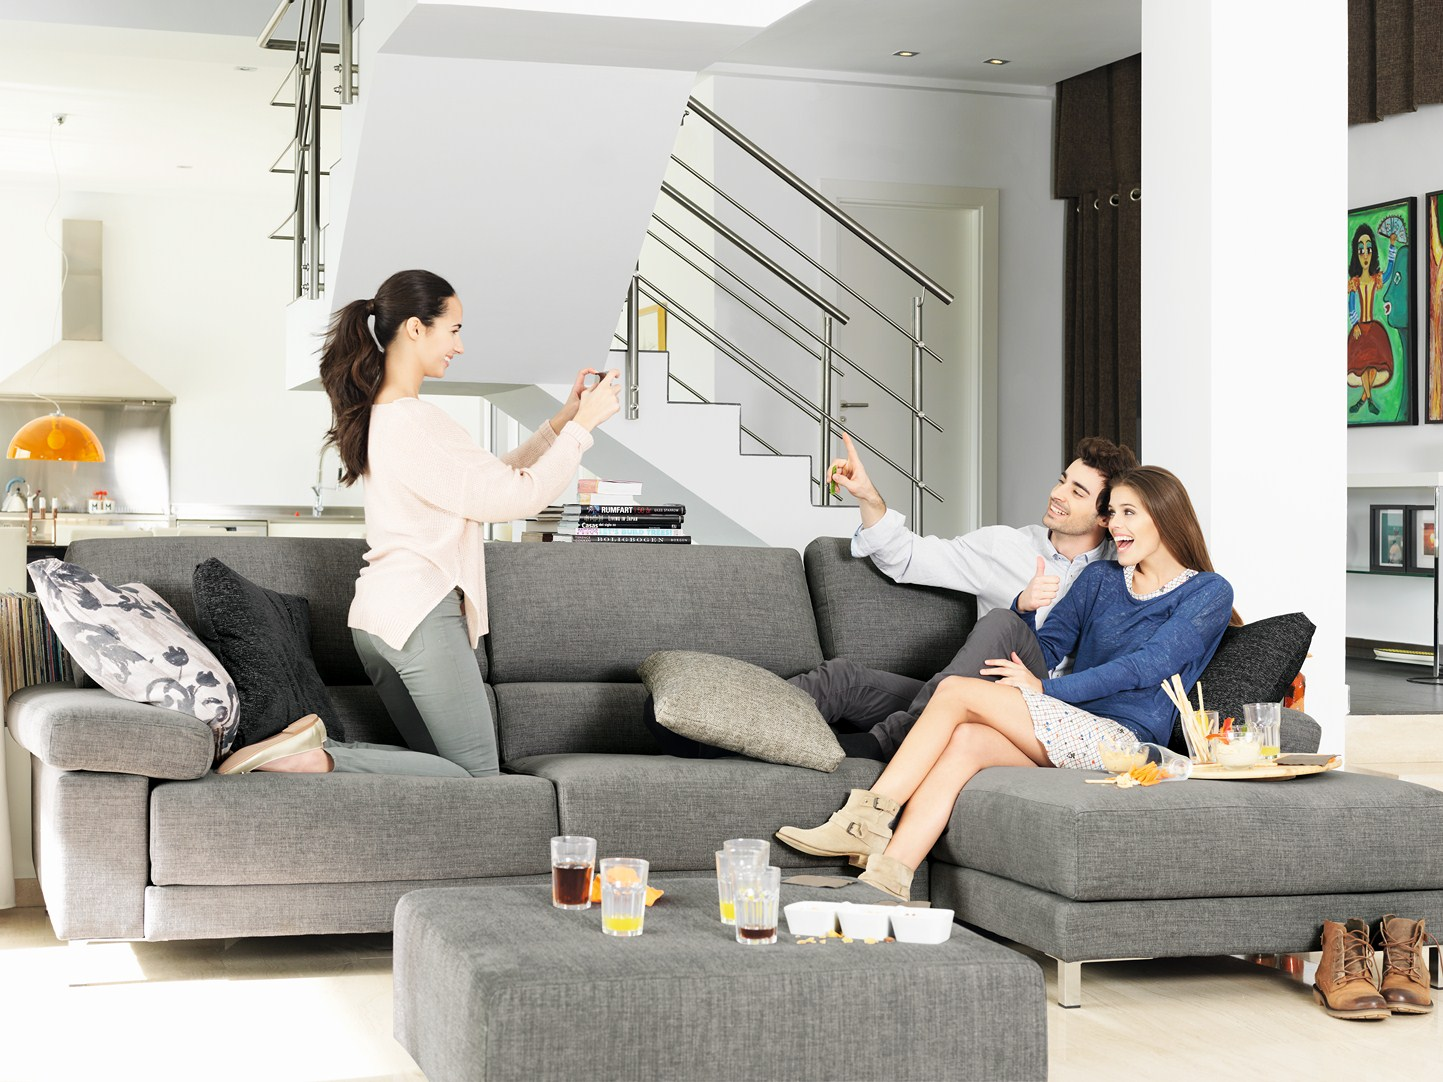 Telas tapiceria visual 1 - Telas para tapizados de sofas ...